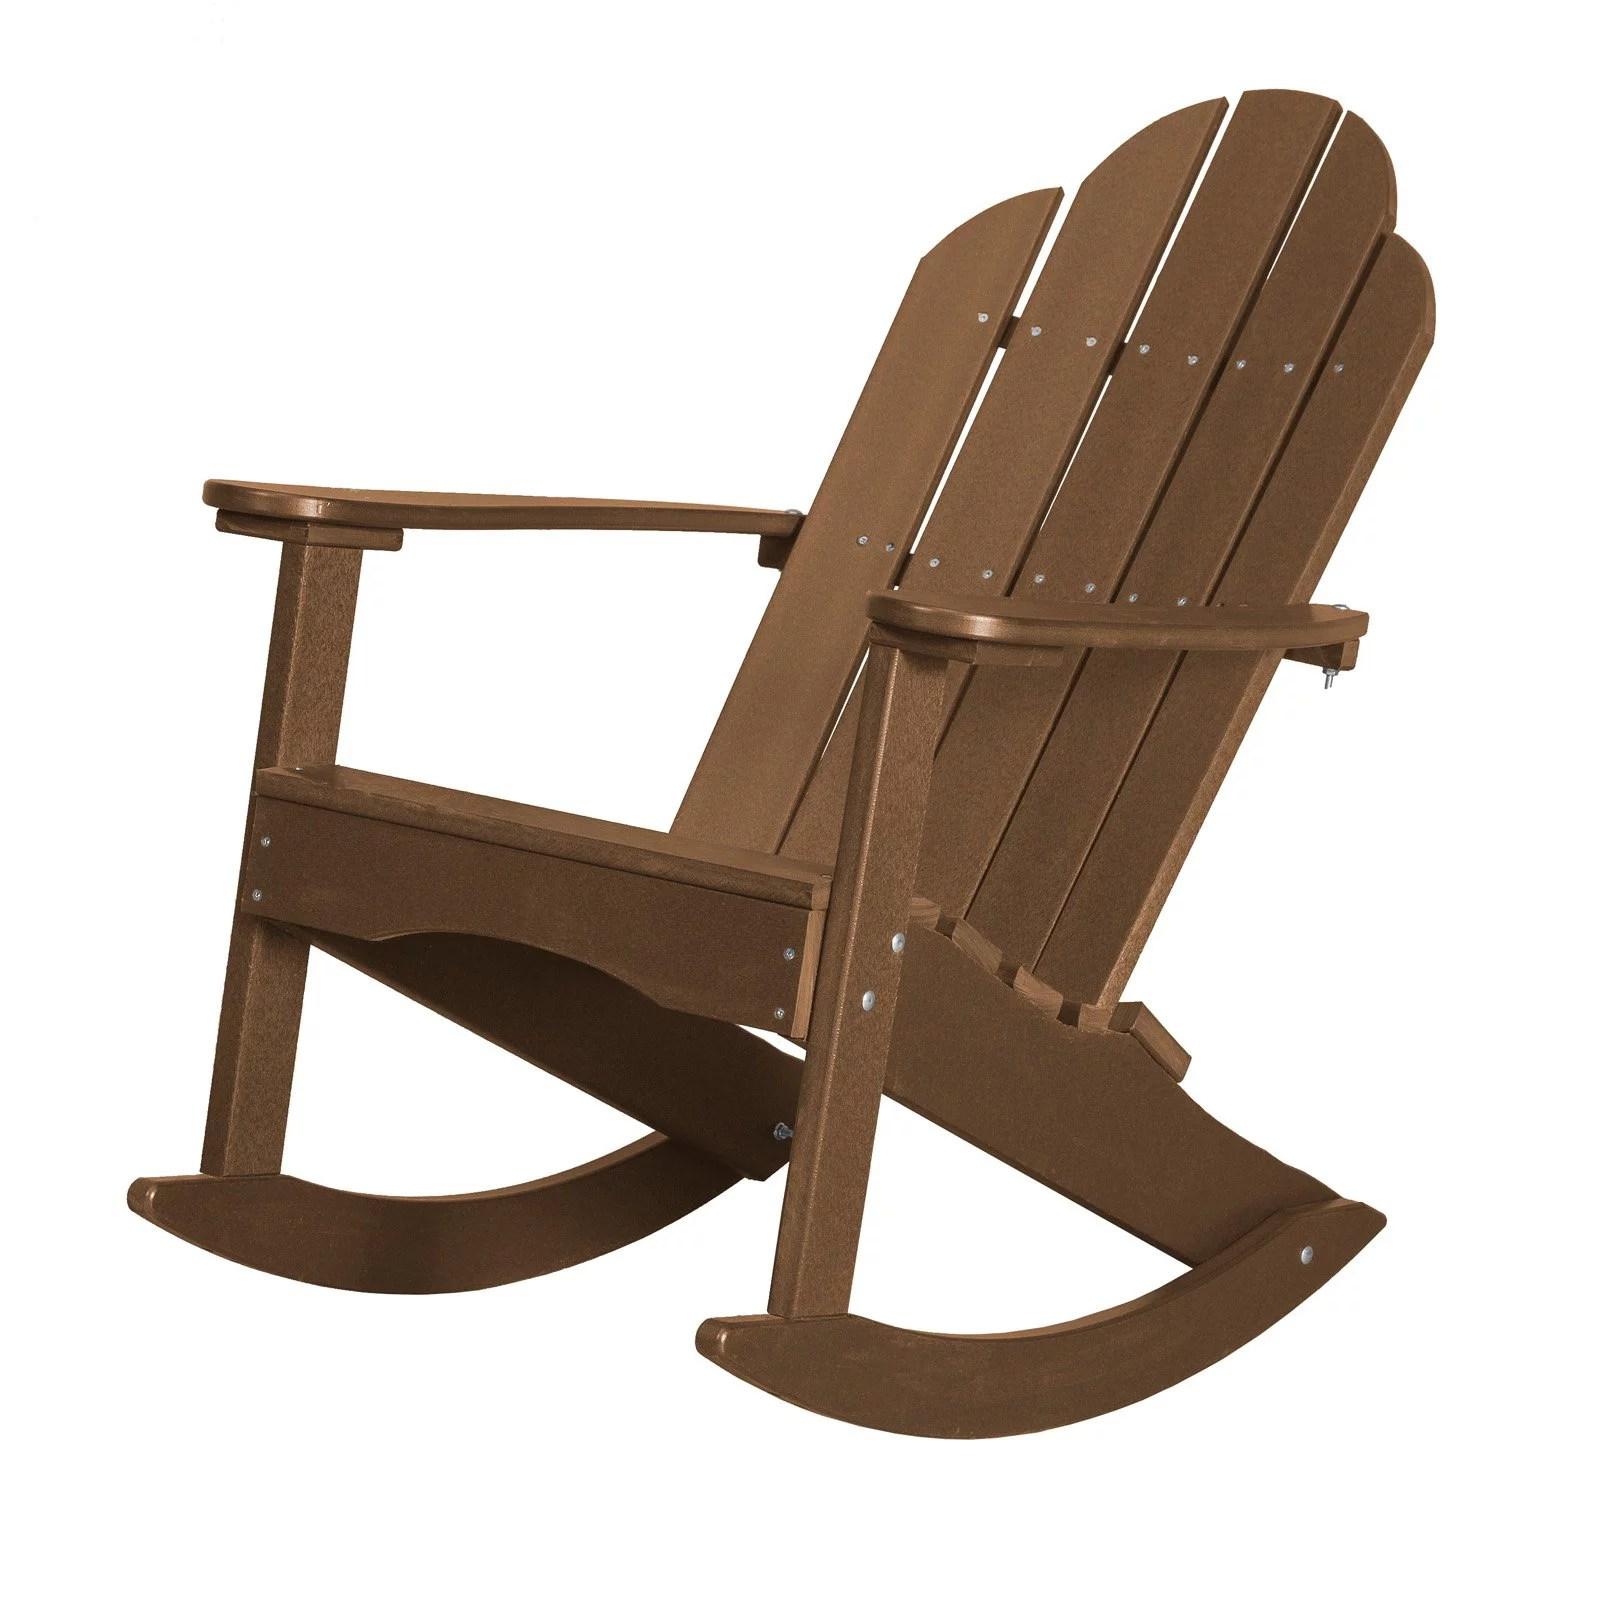 plastic adirondack chairs walmart upholstered office chair on casters wildridge classic rocker